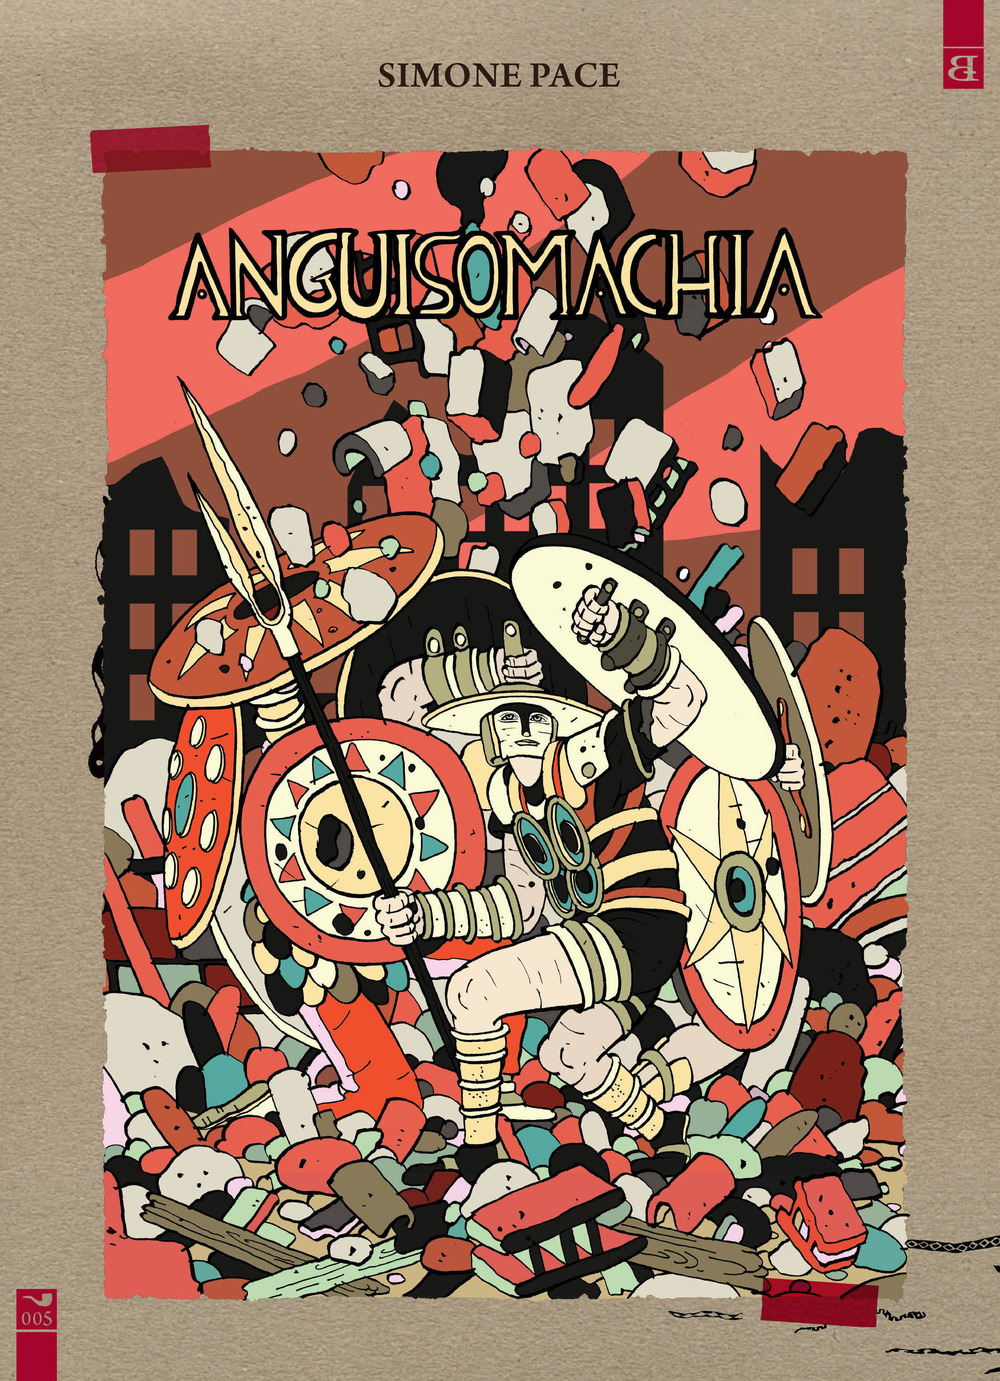 ANGUISOMACHIA - Pace Simone - 9788898462148